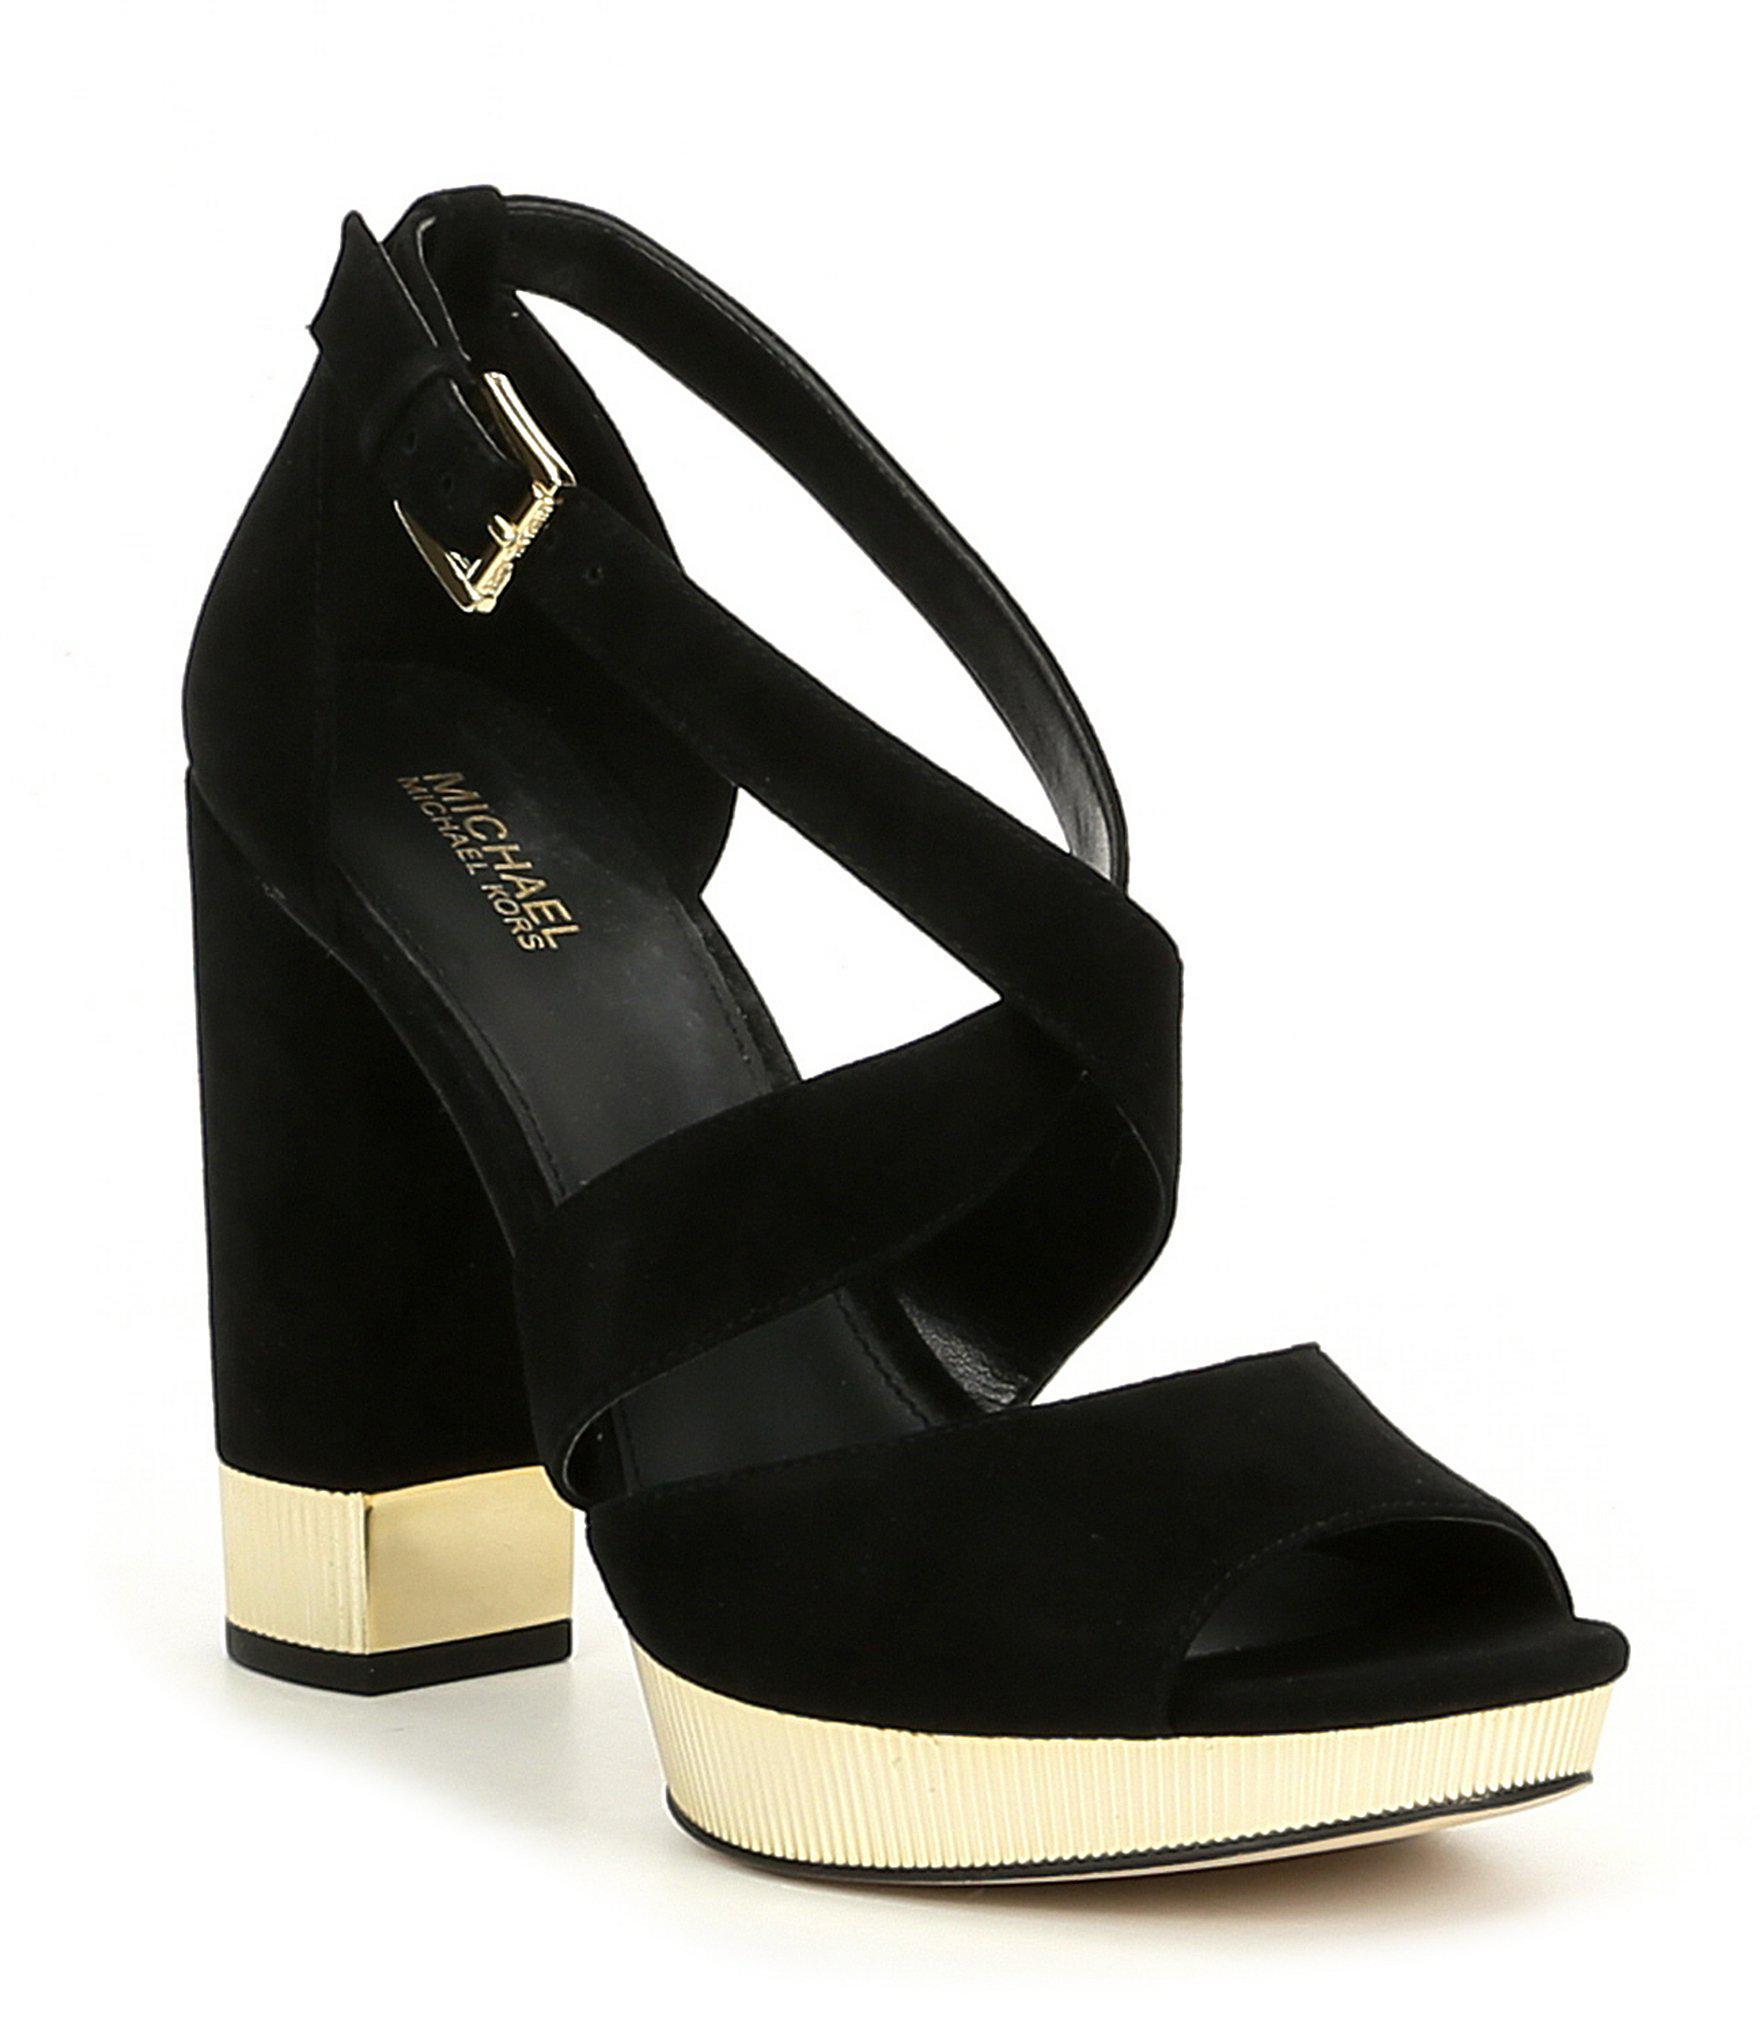 feedeb5a36d5 Michael Michael Kors Valerie Platform Sandal in Black - Lyst